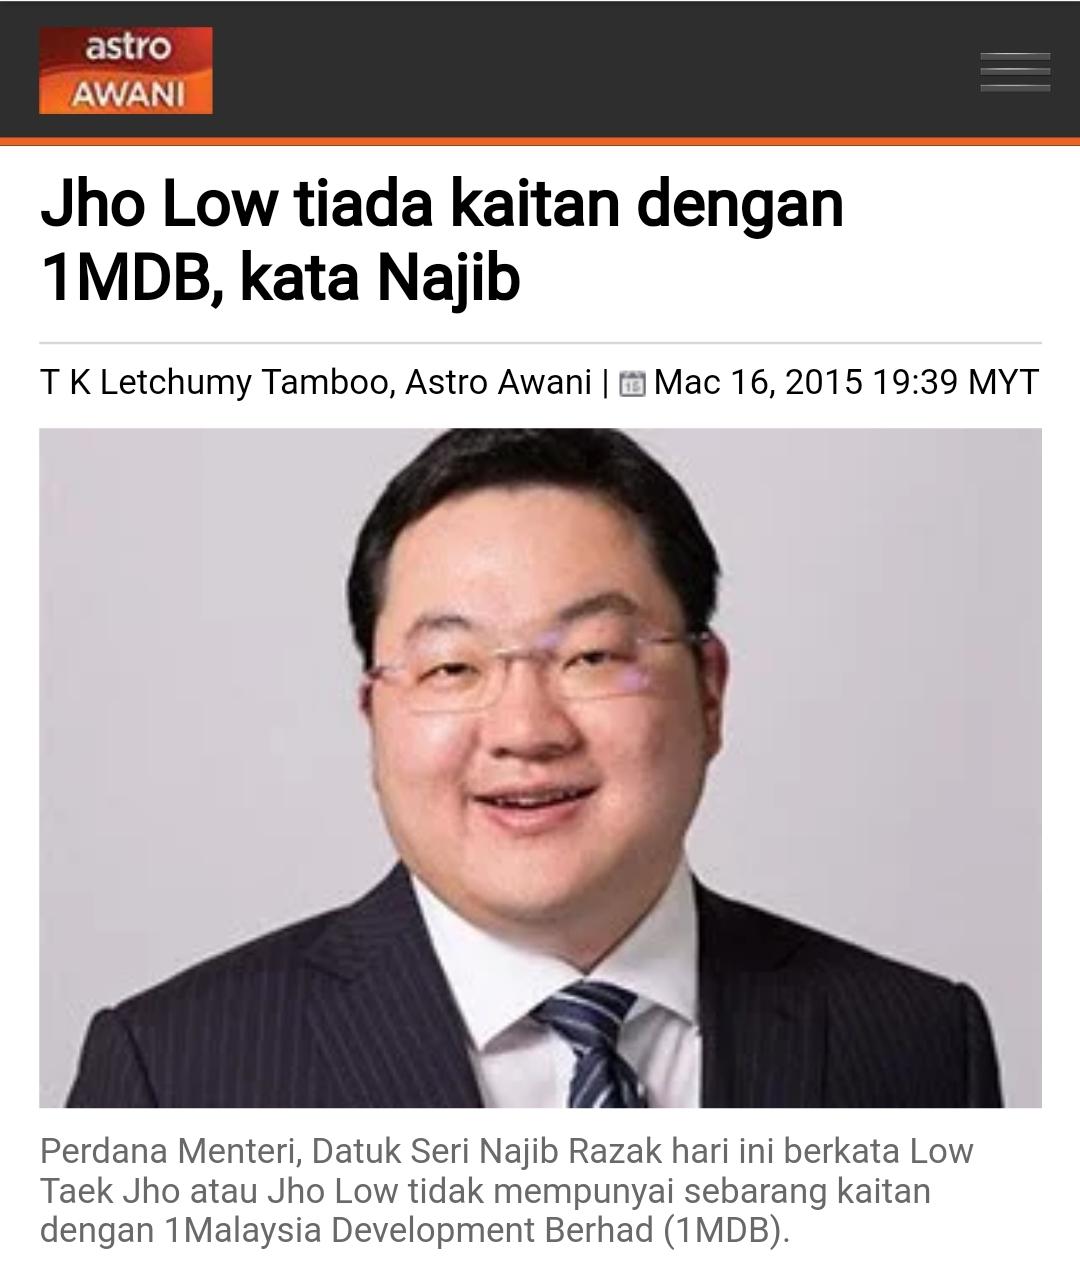 Jho Low Tiada Kaitan